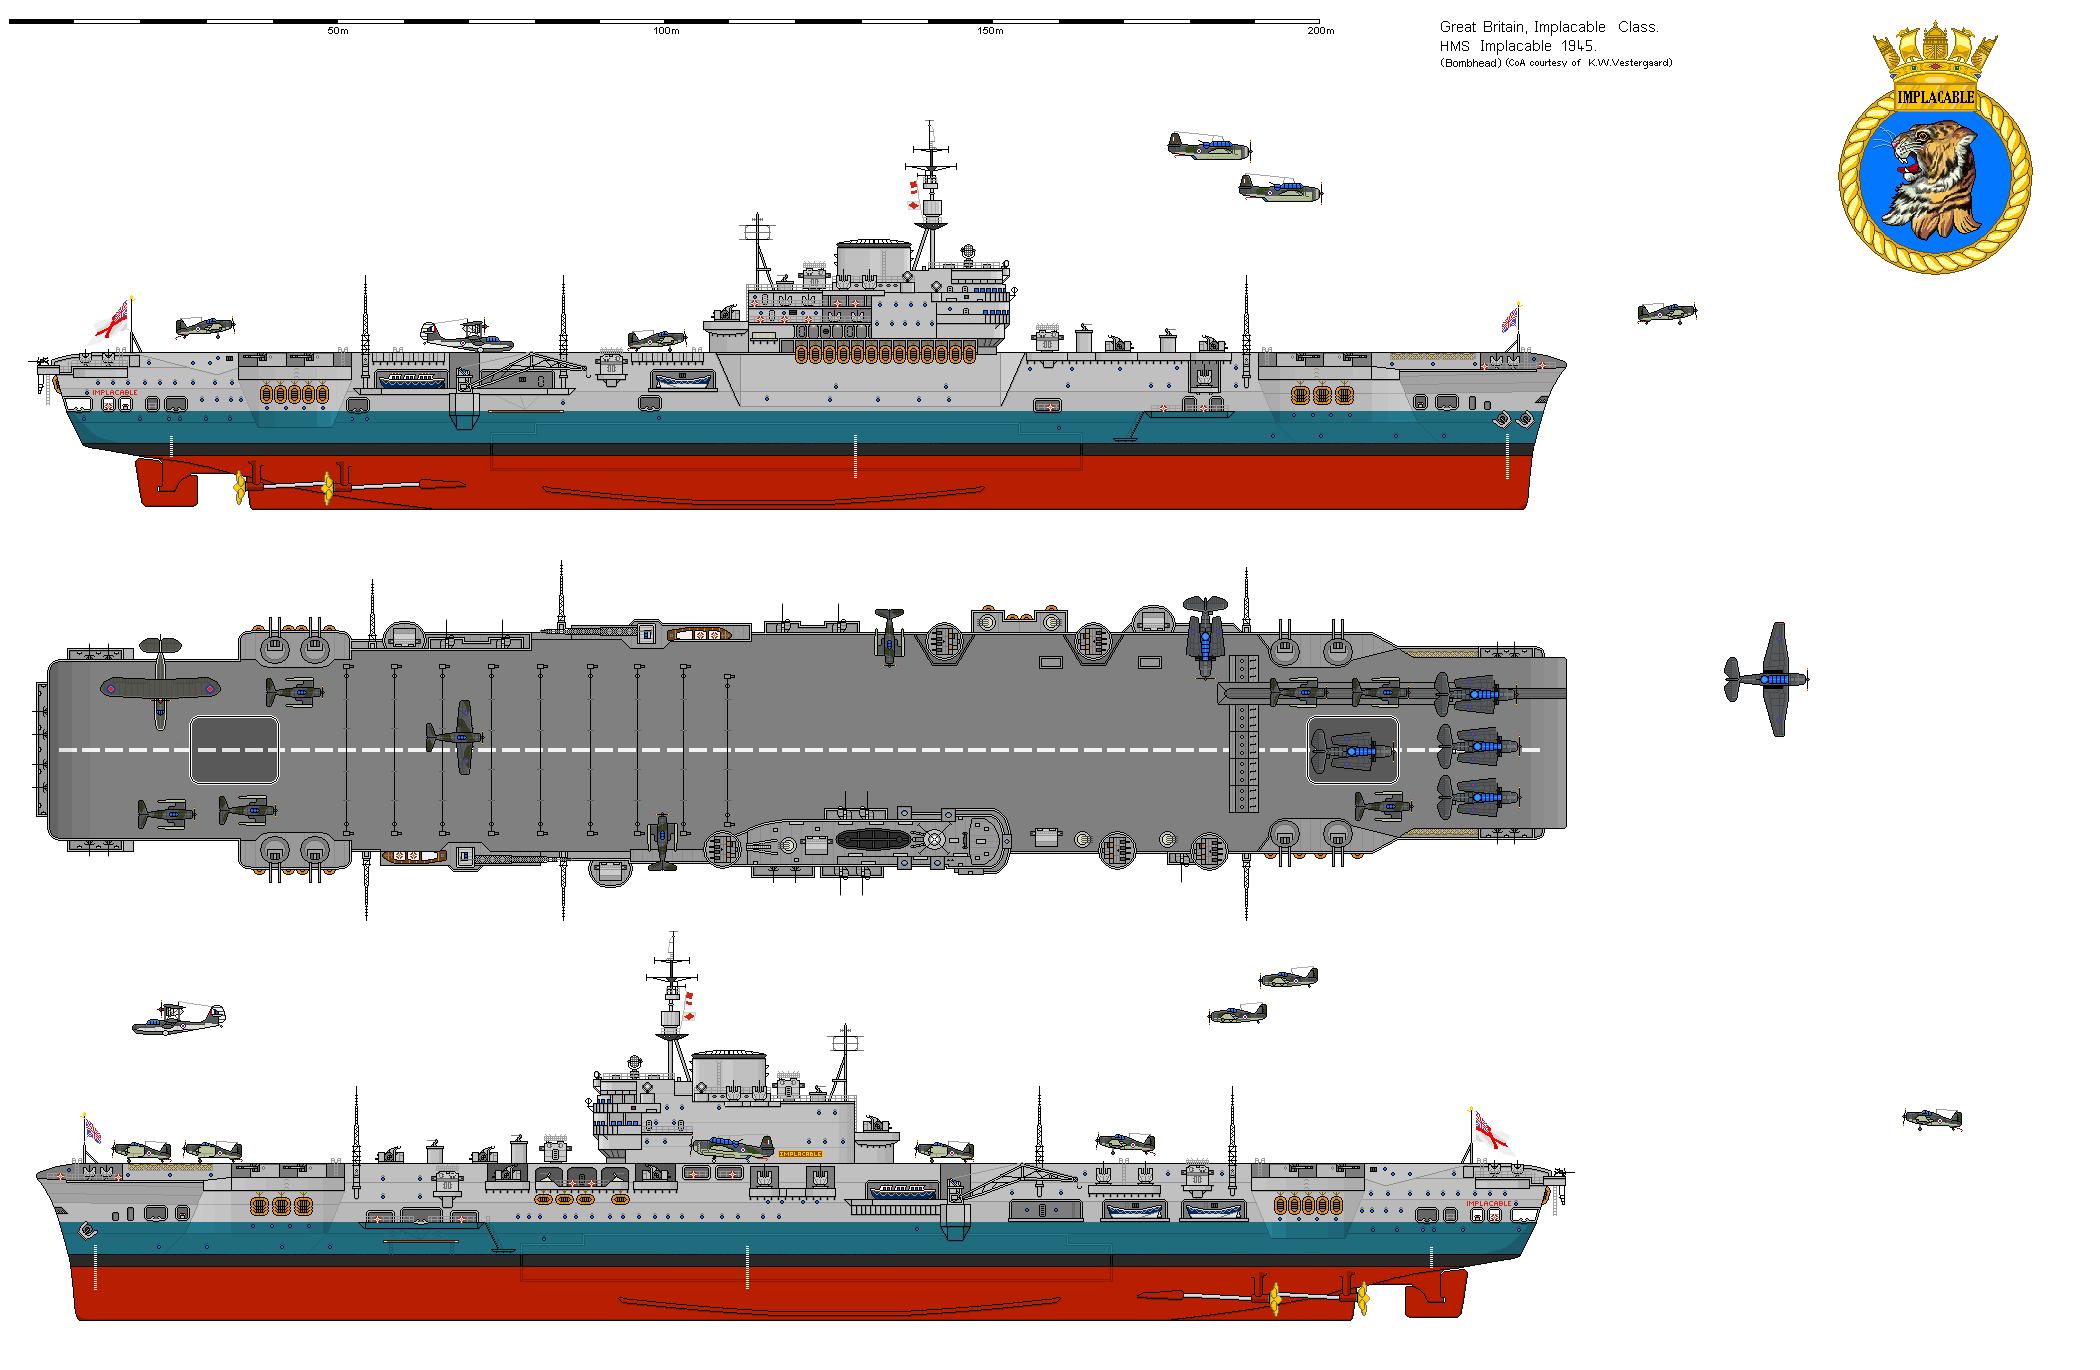 Photo Cvindefatigableclassimplacable Png Navy Ships Royal Navy Ships Aircraft Carrier